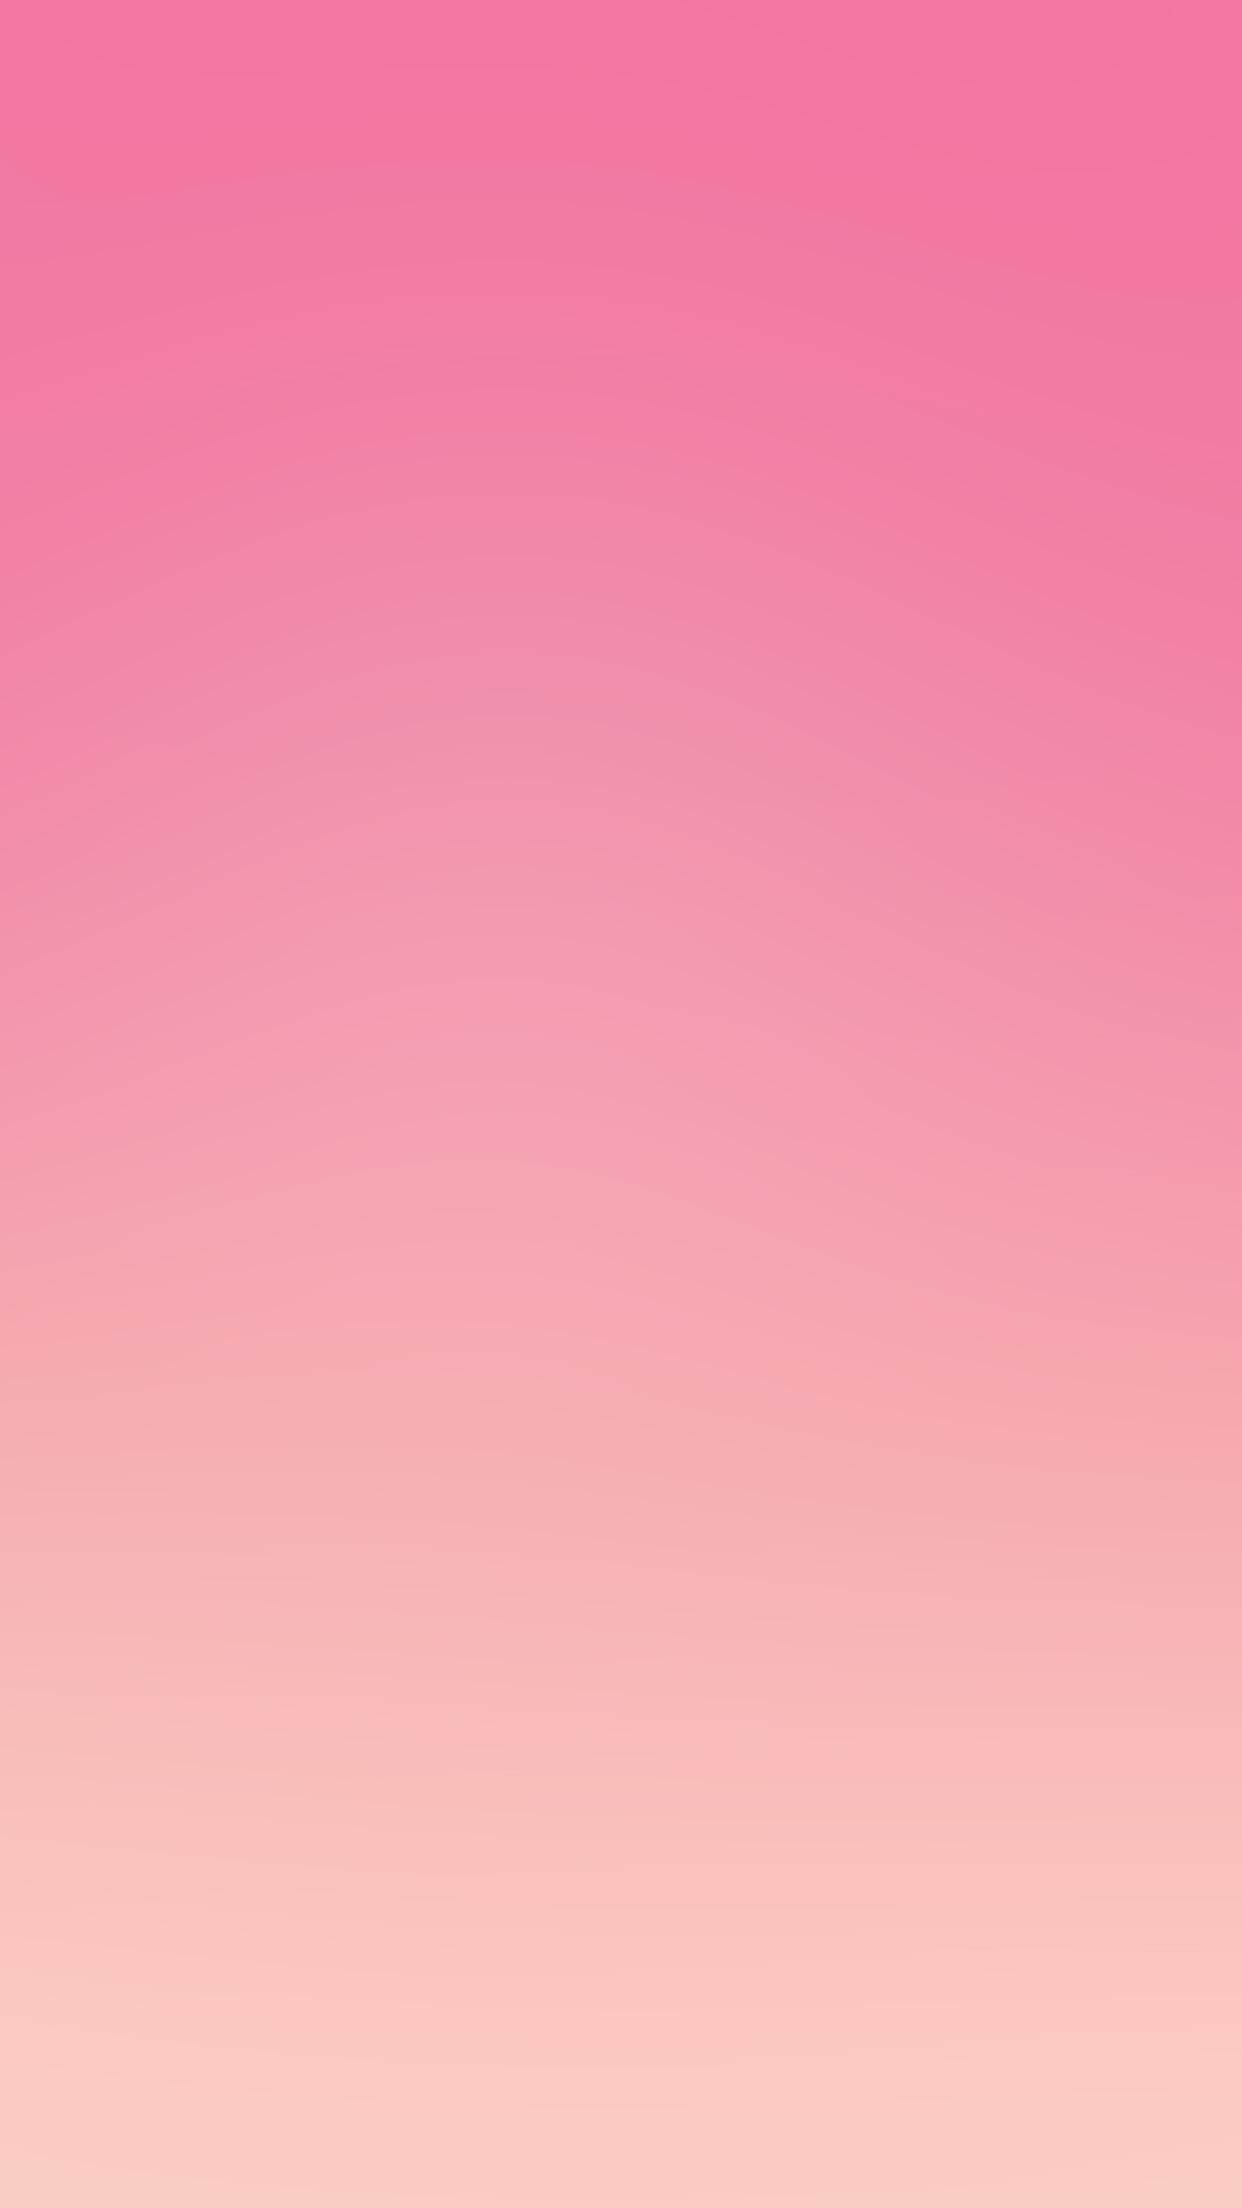 Victoria Secret Wallpaper Iphone 5 Iphone Se